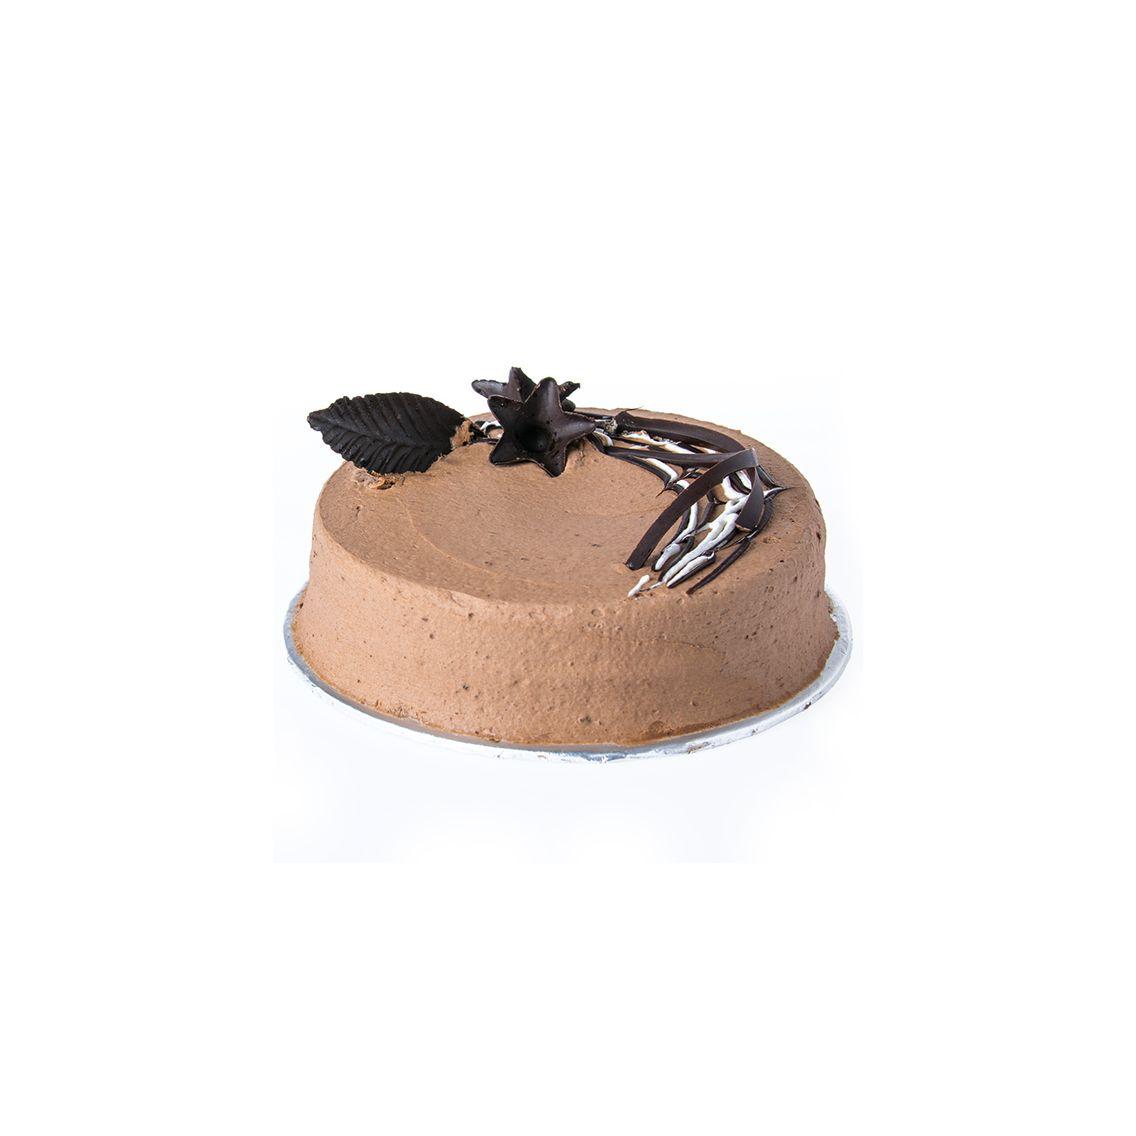 Kitchen Cuisine Default Category Chocolate Fudge Cake